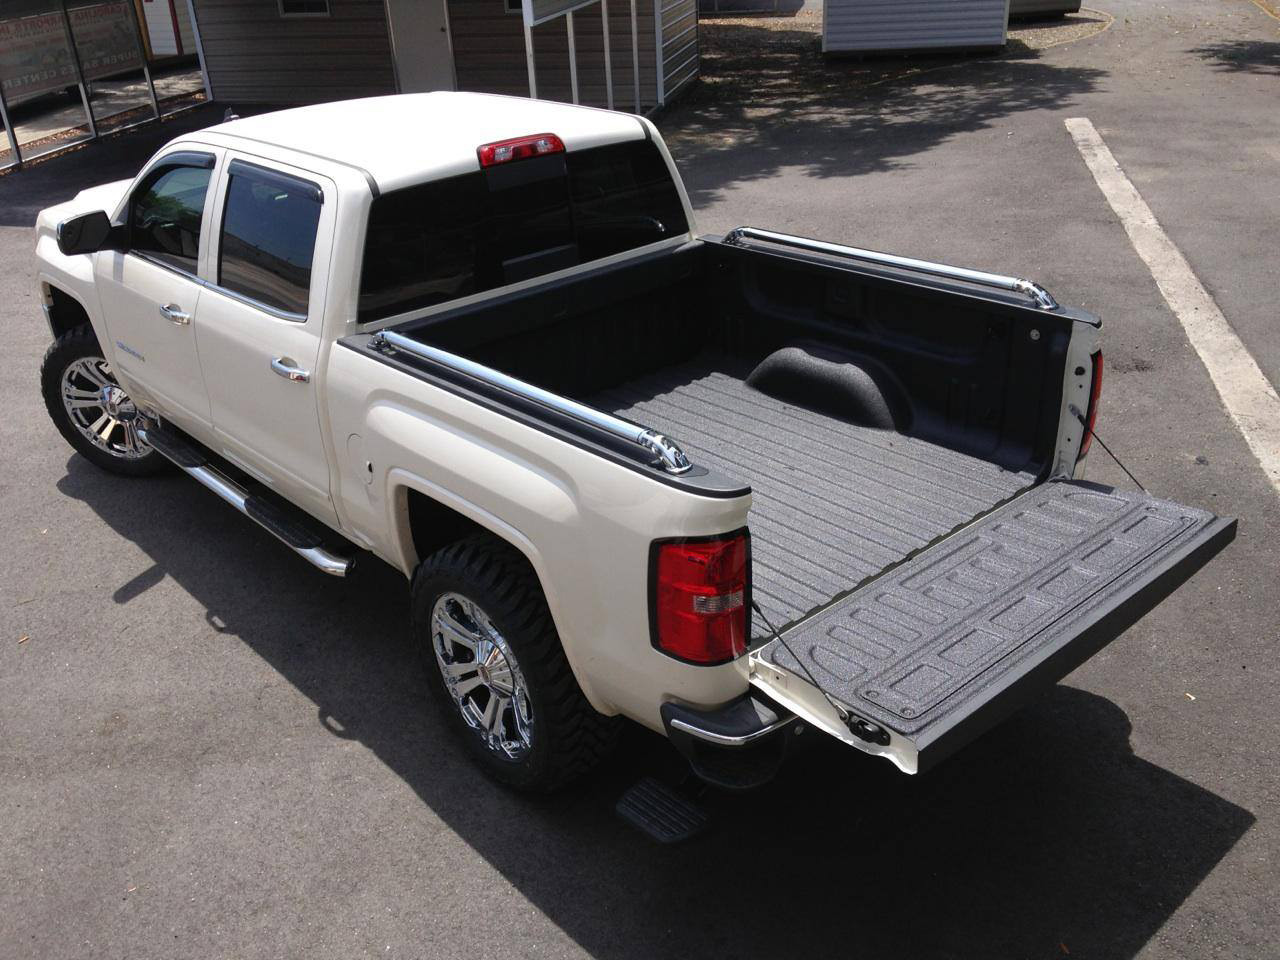 bedliner spray automotive in on liner kits scorpion dsi bed